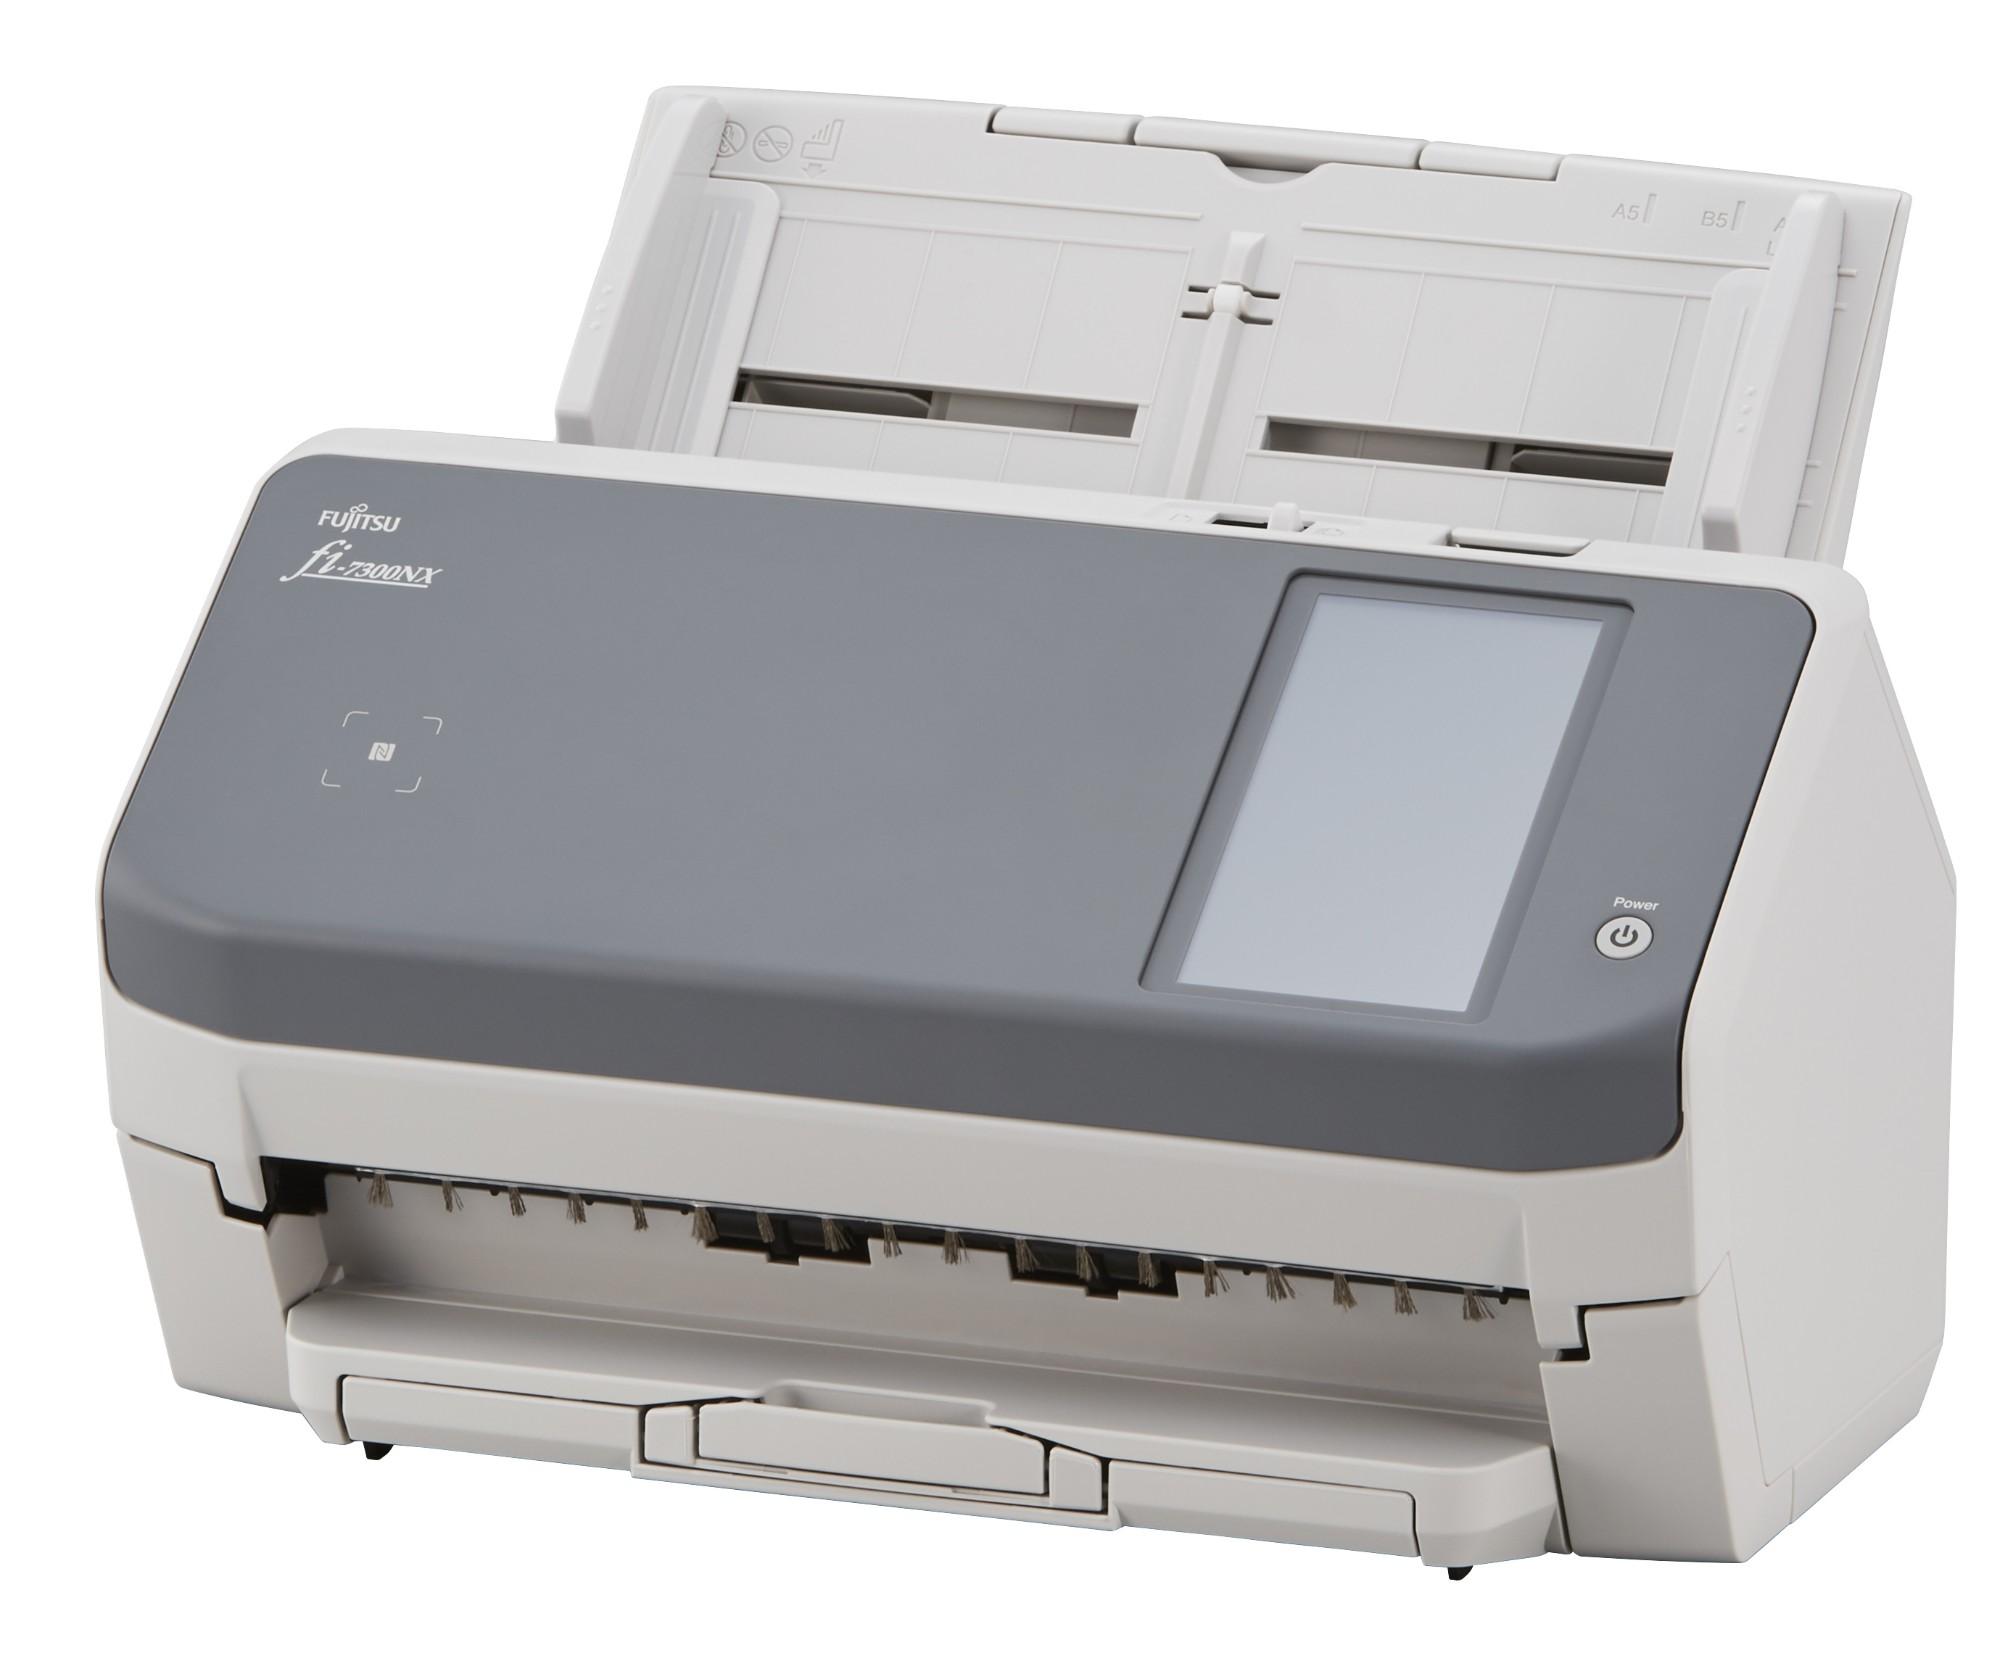 Fujitsu fi-7300NX ADF scanner 600 x 600DPI A4 Grey, White PA03768-B001